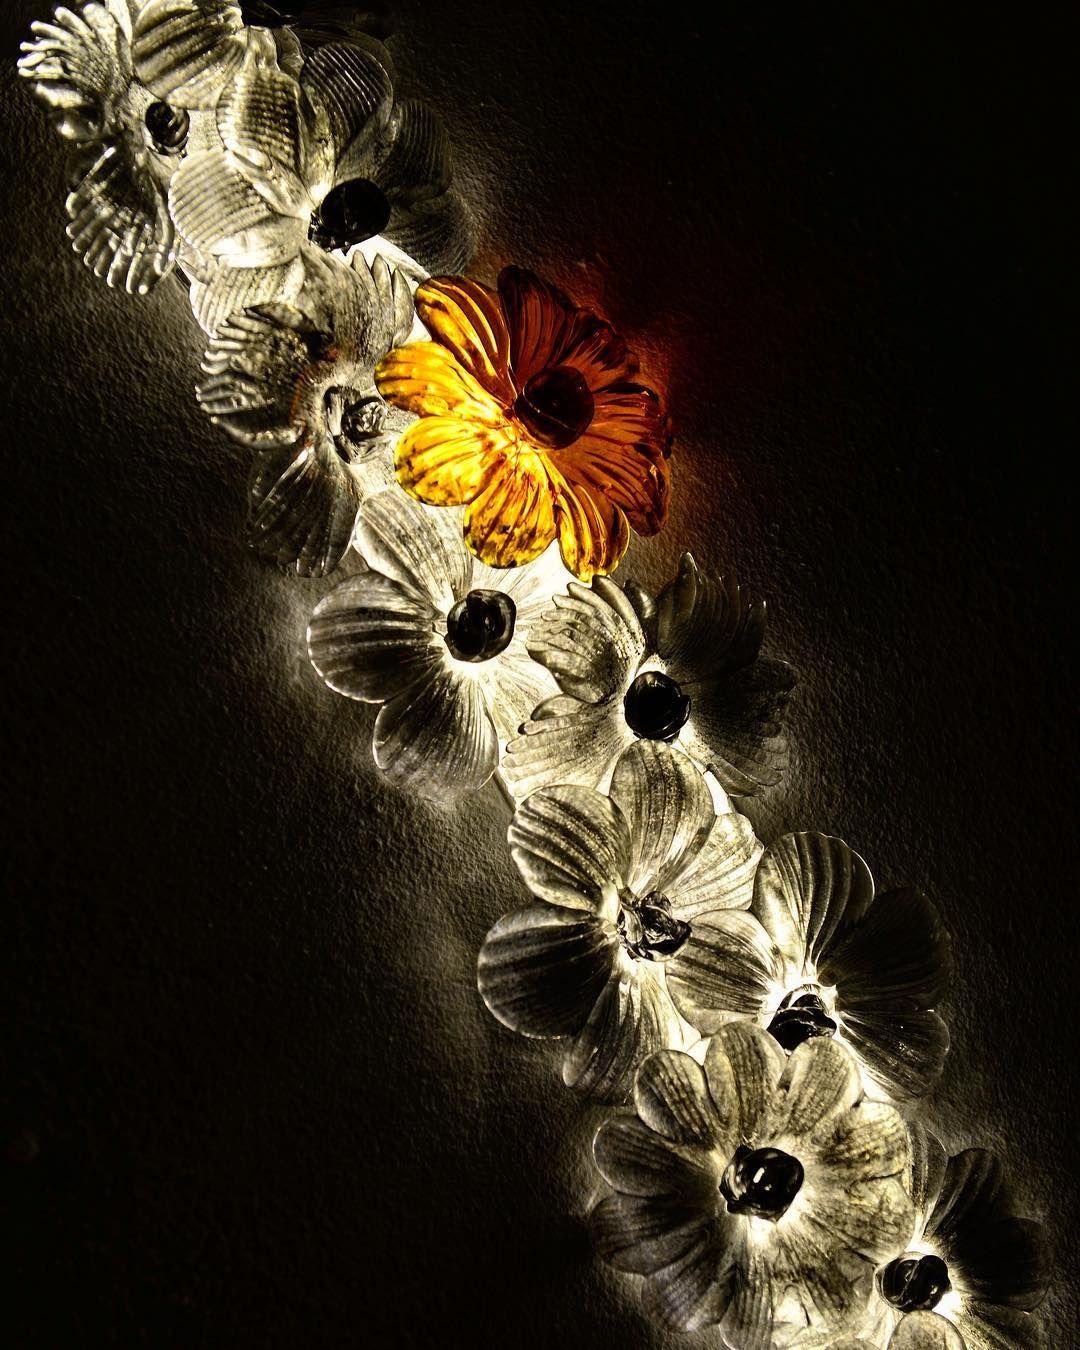 Dare to be different #andromedamurano #andromedasculptlights #Residential  #Apartmentsinterior #hauseinterior #homedesign #interiorhomedesign #Sculptures #Artsculptures #artlightsculptures #lightiningdesign #gardenlight #gardendesign #nightlight #outdoorlight #glasssculptures #Muranoglass #wood #rockcristal #Led #Ip67 #homedecor #moderndesign #modernarchitecture #modernhome #instainterior